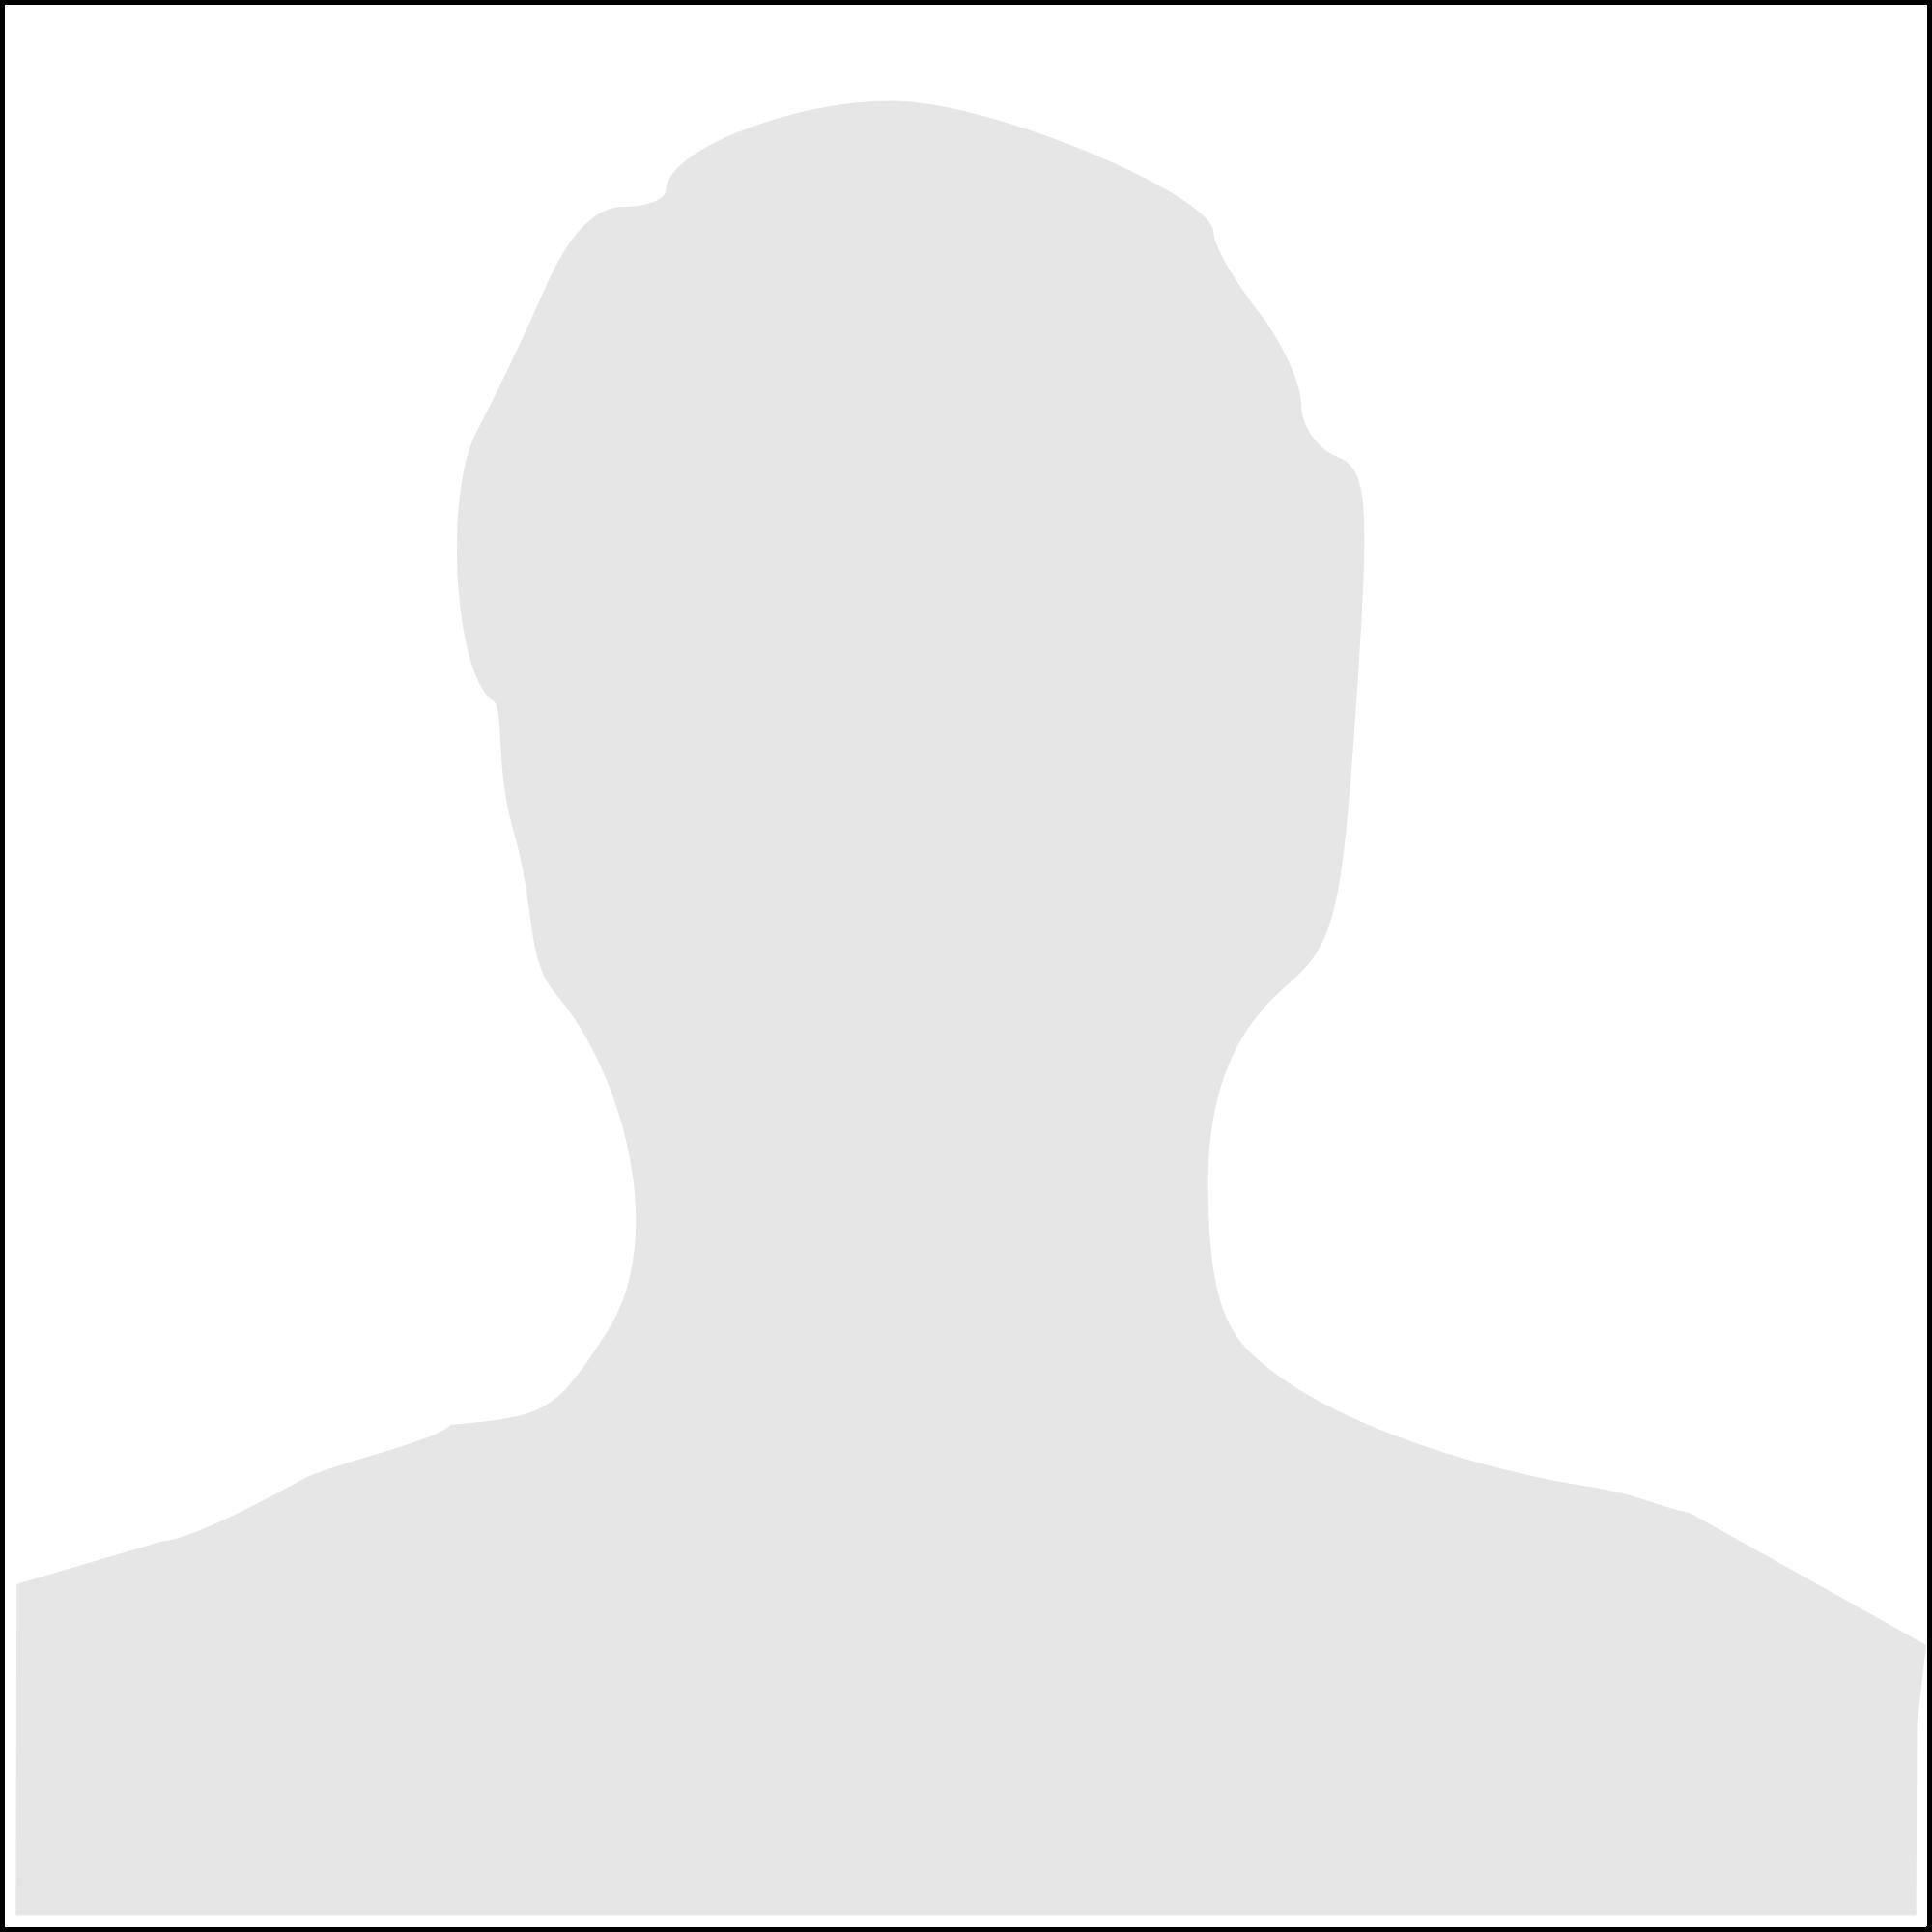 Norva Pickett headshot